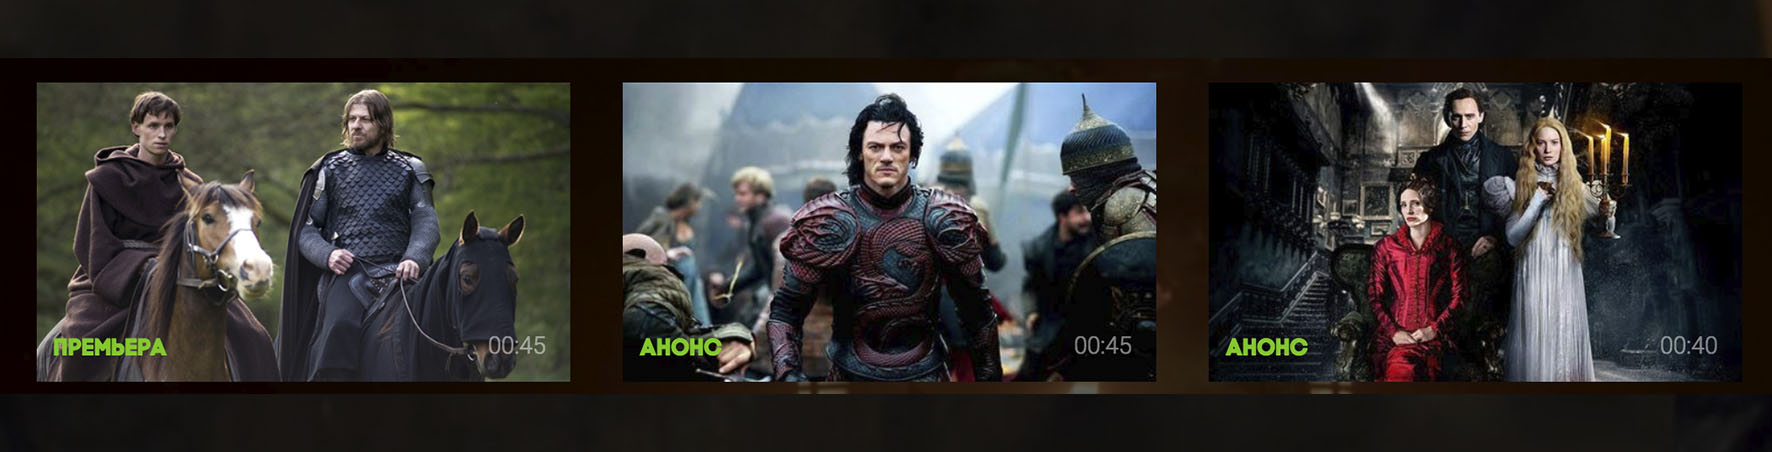 Реклама на ТВ-3 КМВ размещение